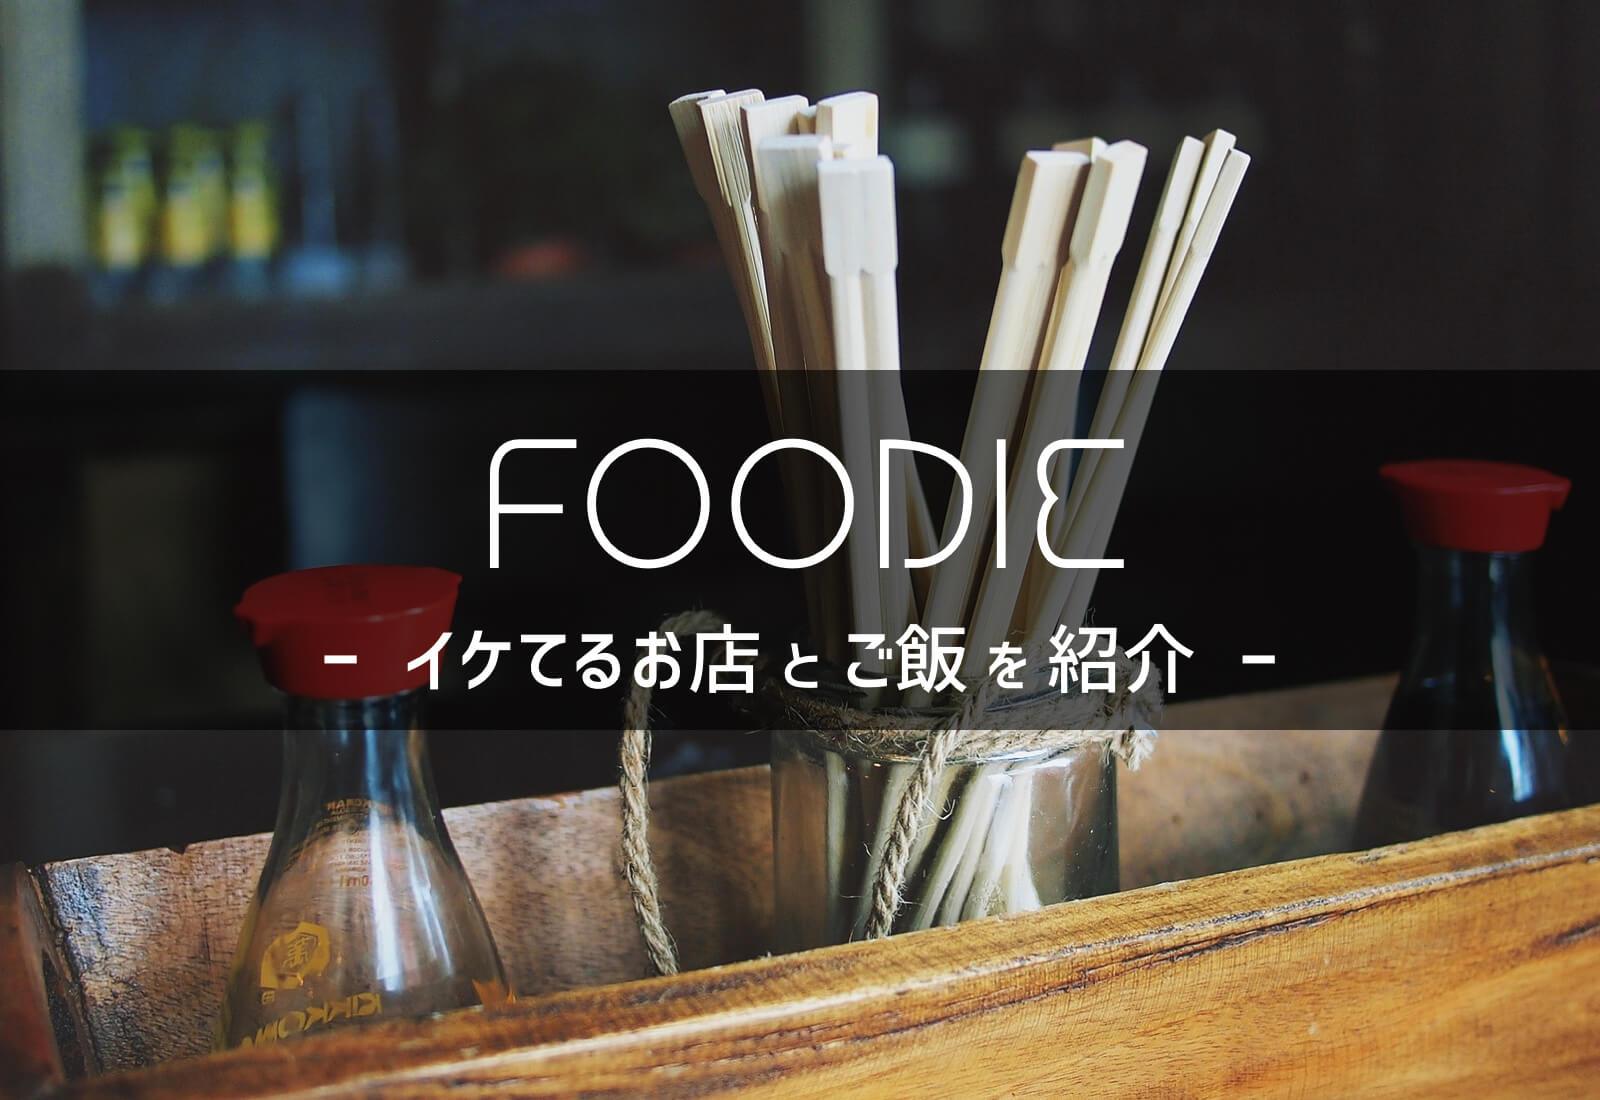 FOODIE|イケてるお店とご飯の紹介